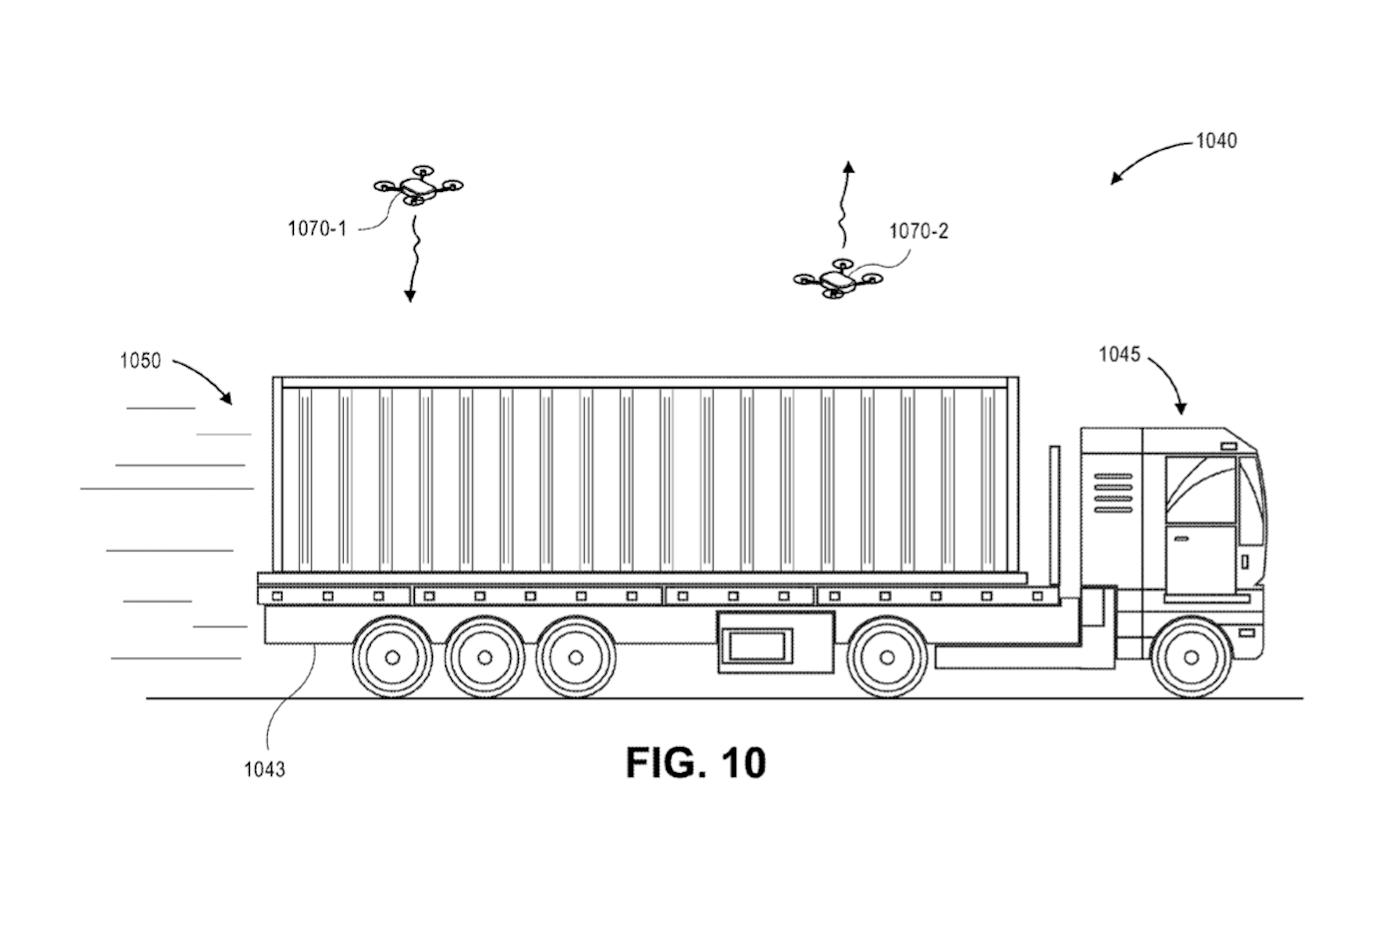 Amazon無人機配送新藍圖:組織陸海空行動艦隊